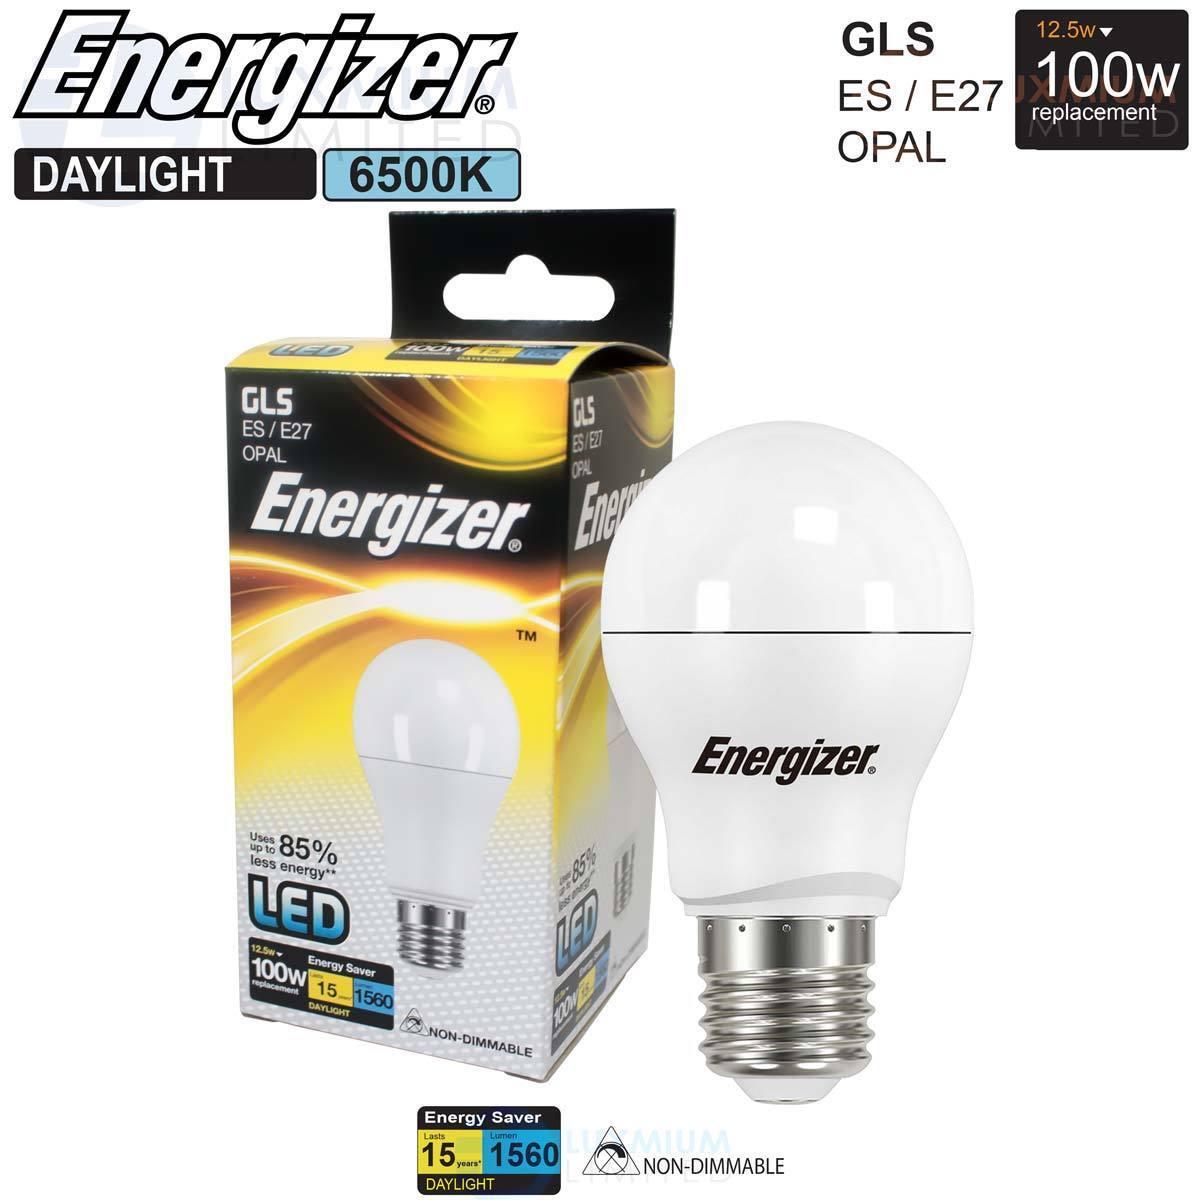 Energizer LED GLS Energy Saving Lightbulb E27 Daylight